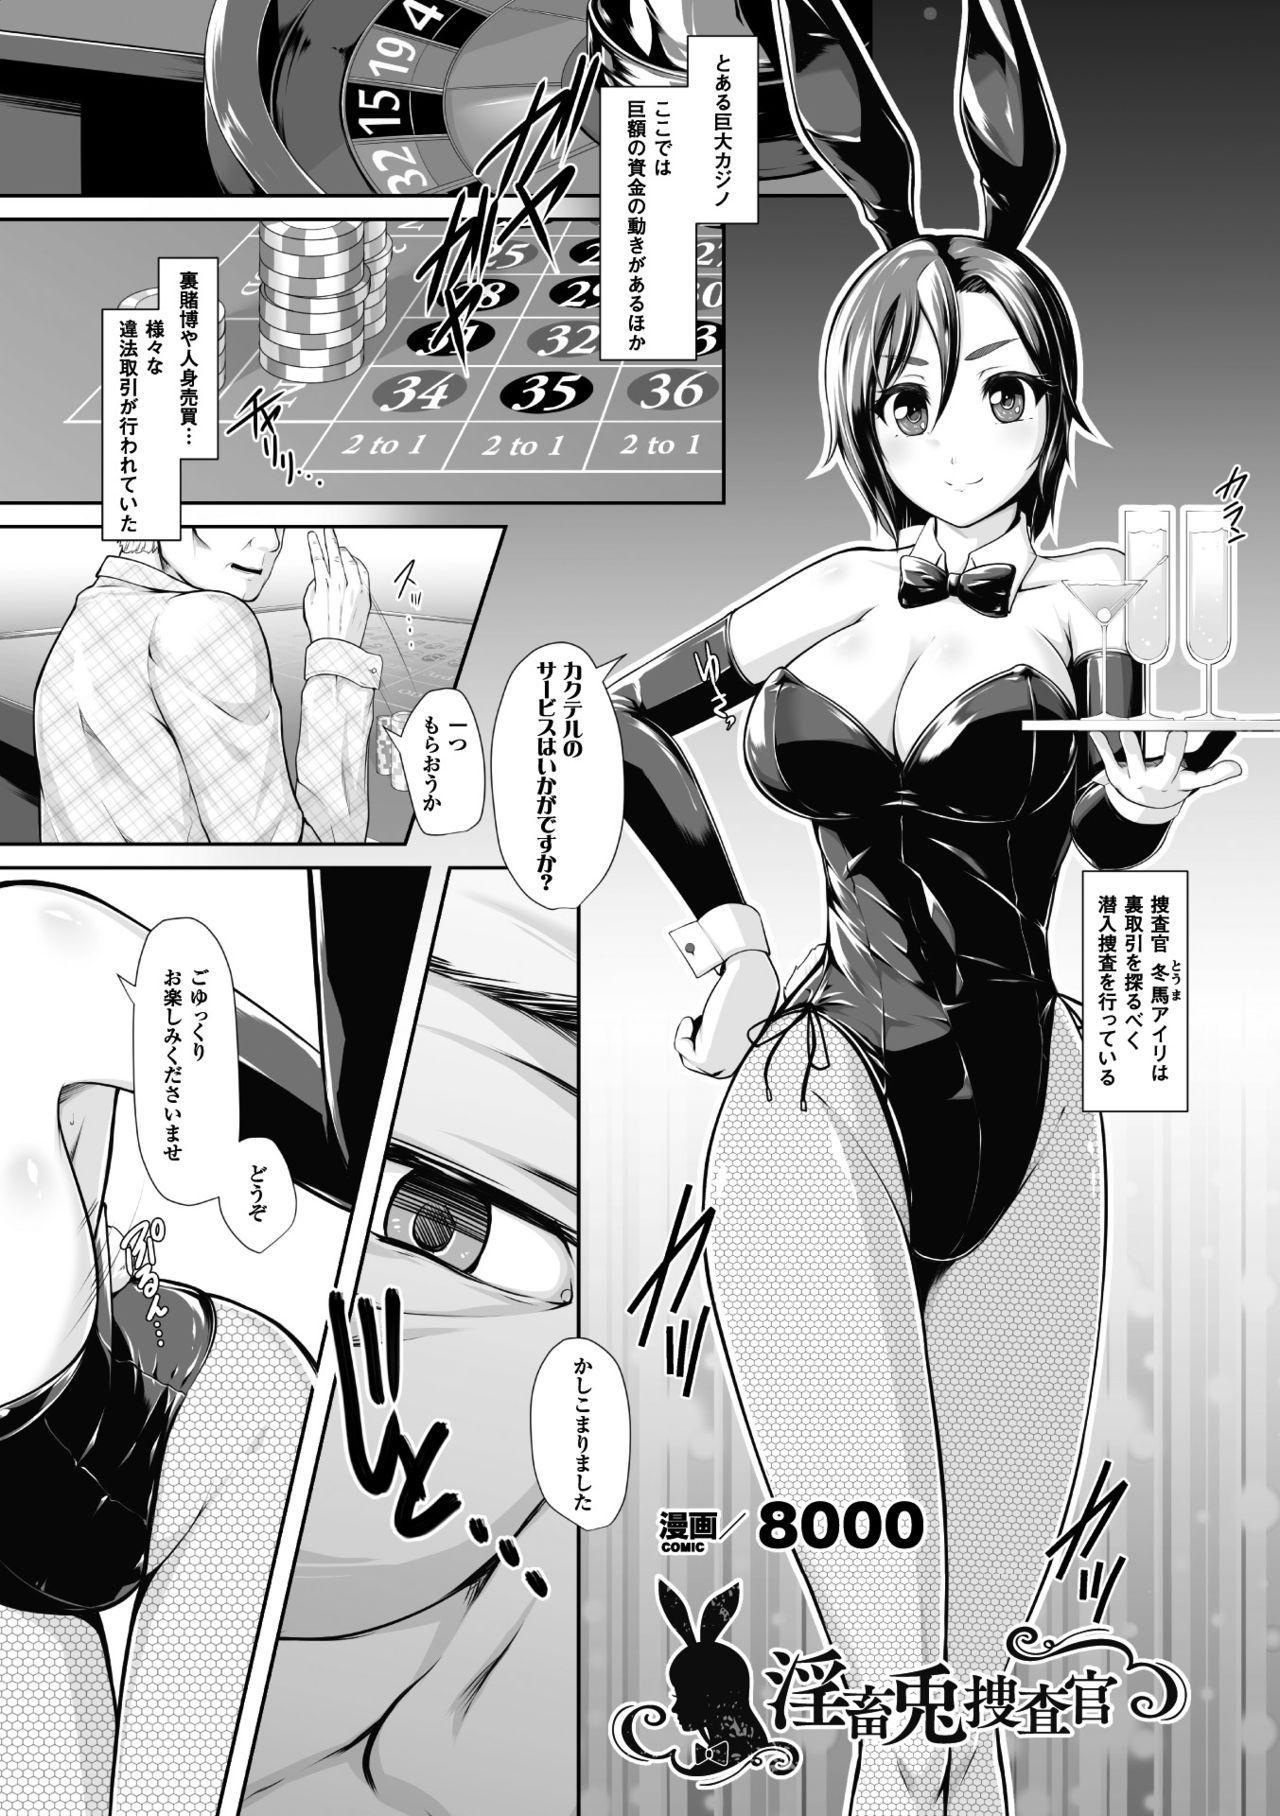 2D Comic Magazine Waki Feti Bunny Girl Vol. 1 4